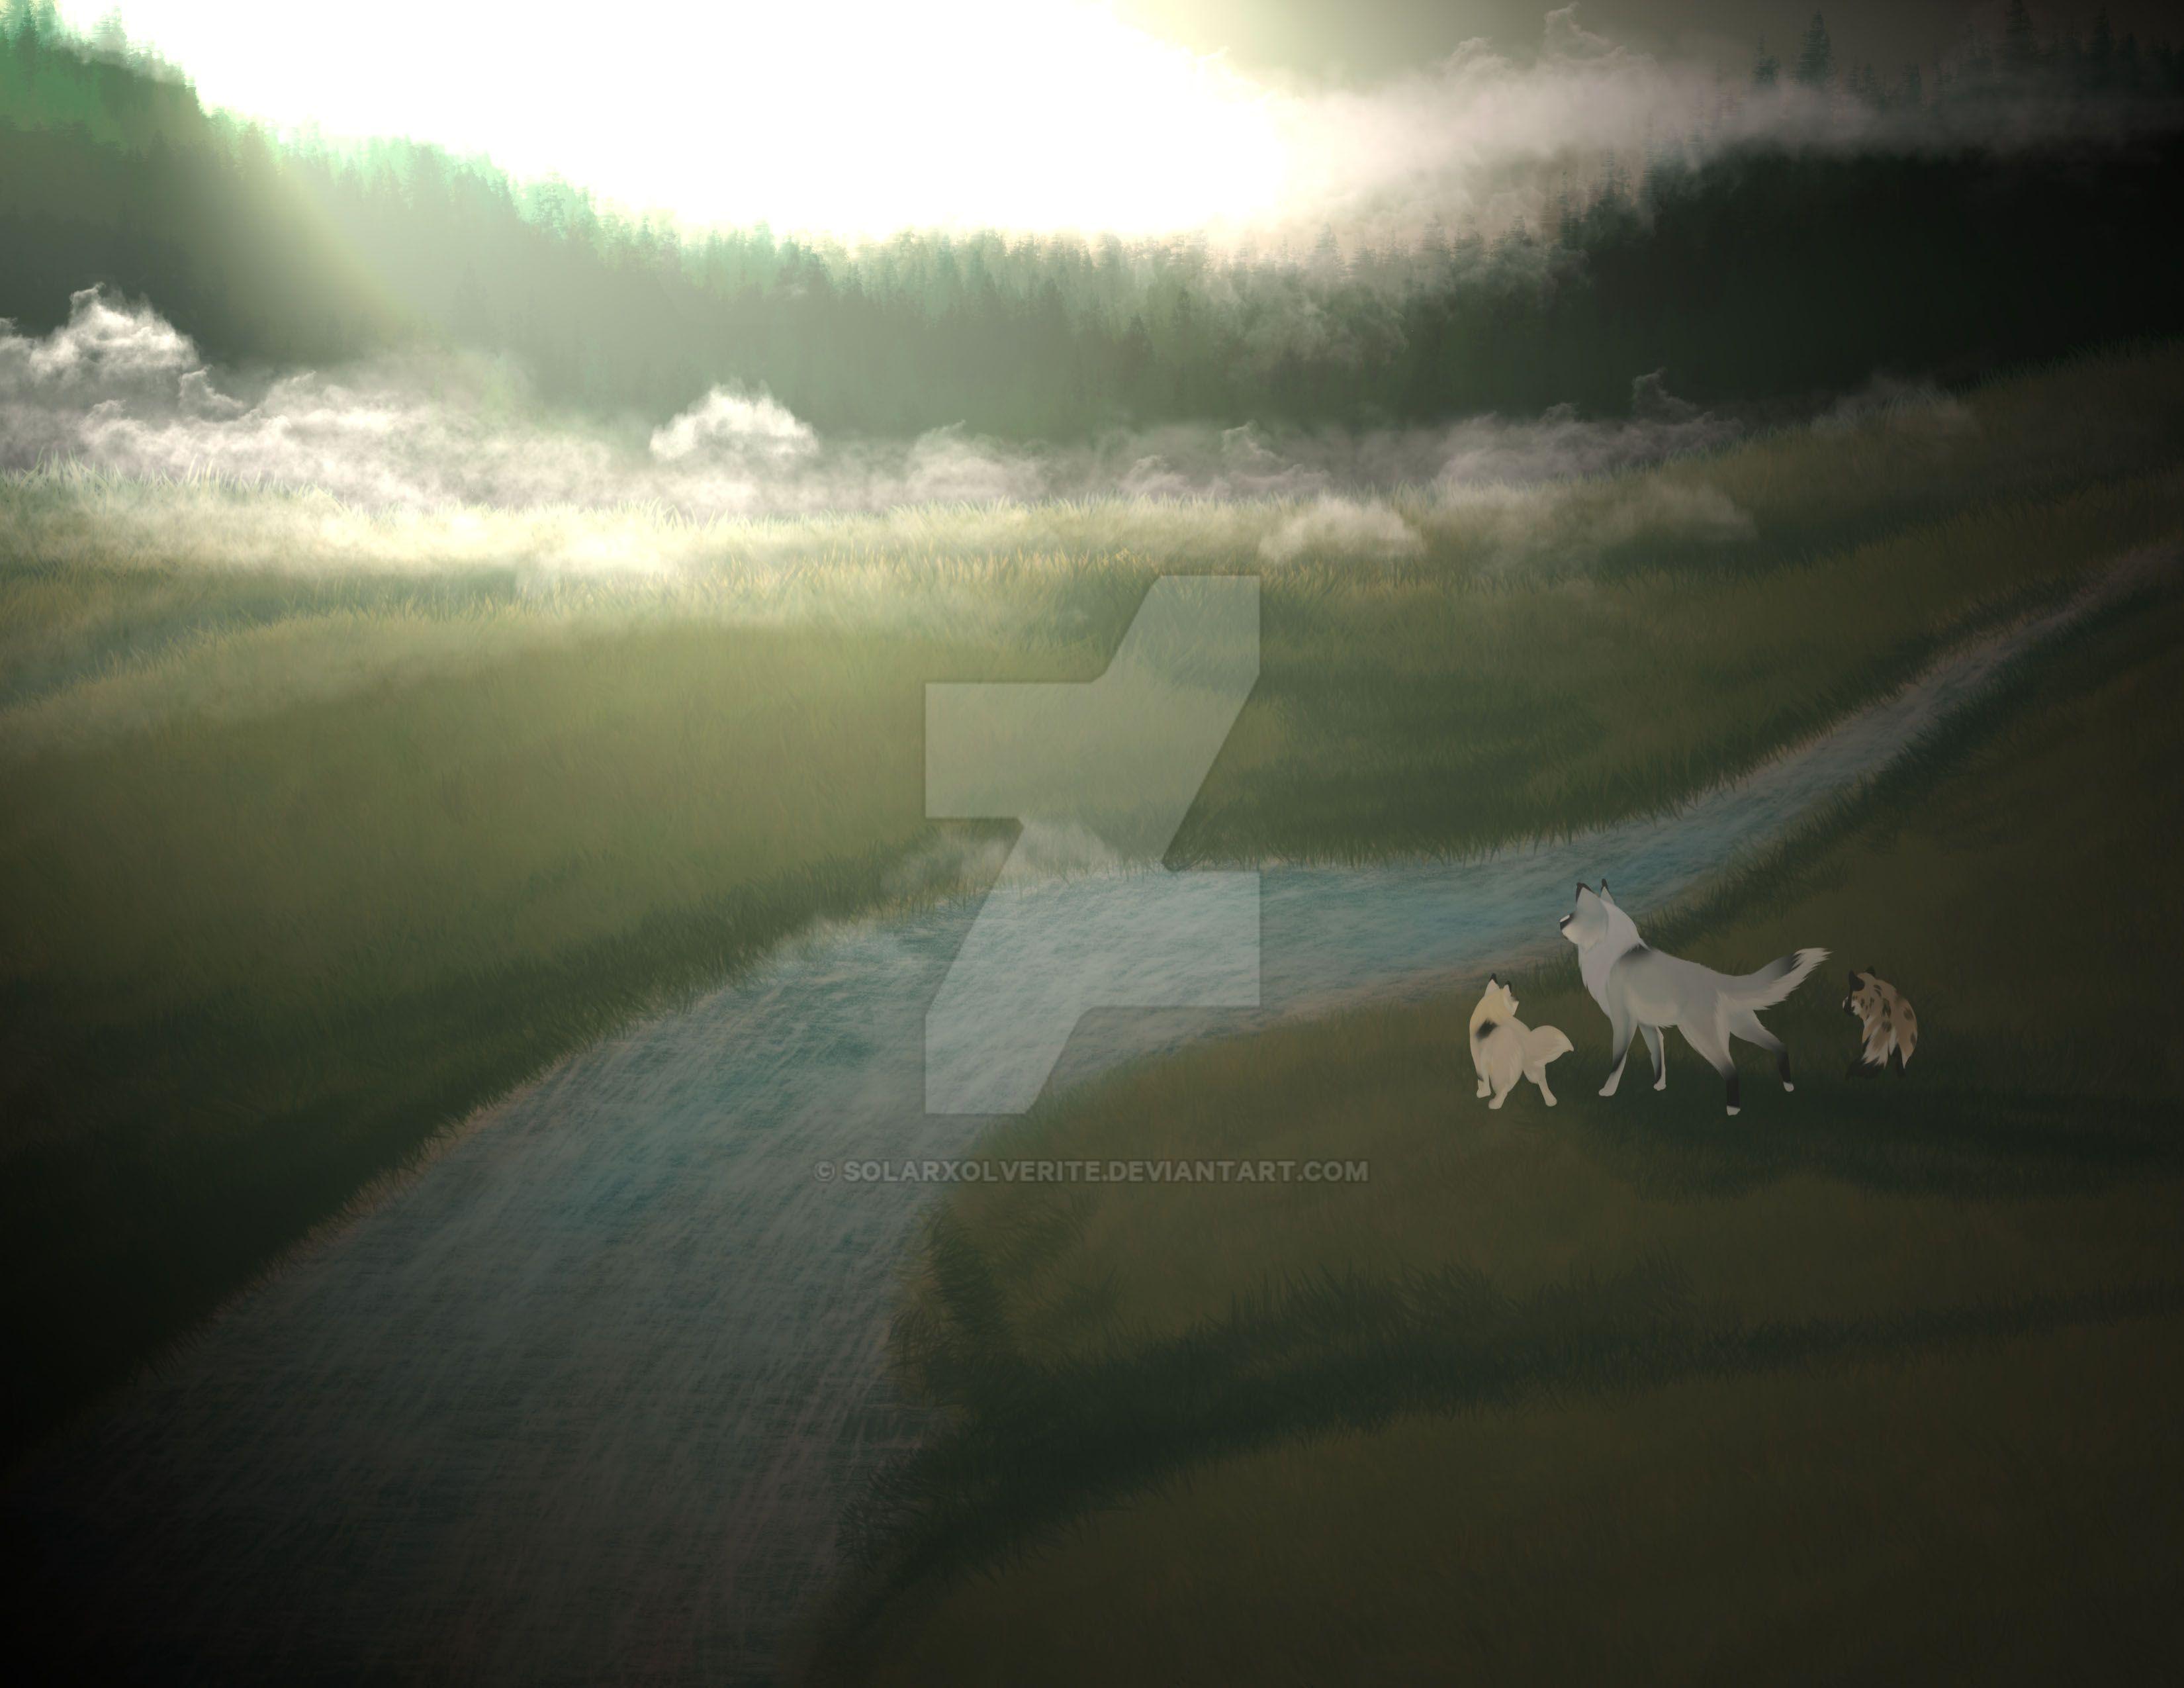 Rite of fortitude by SolarXolverite